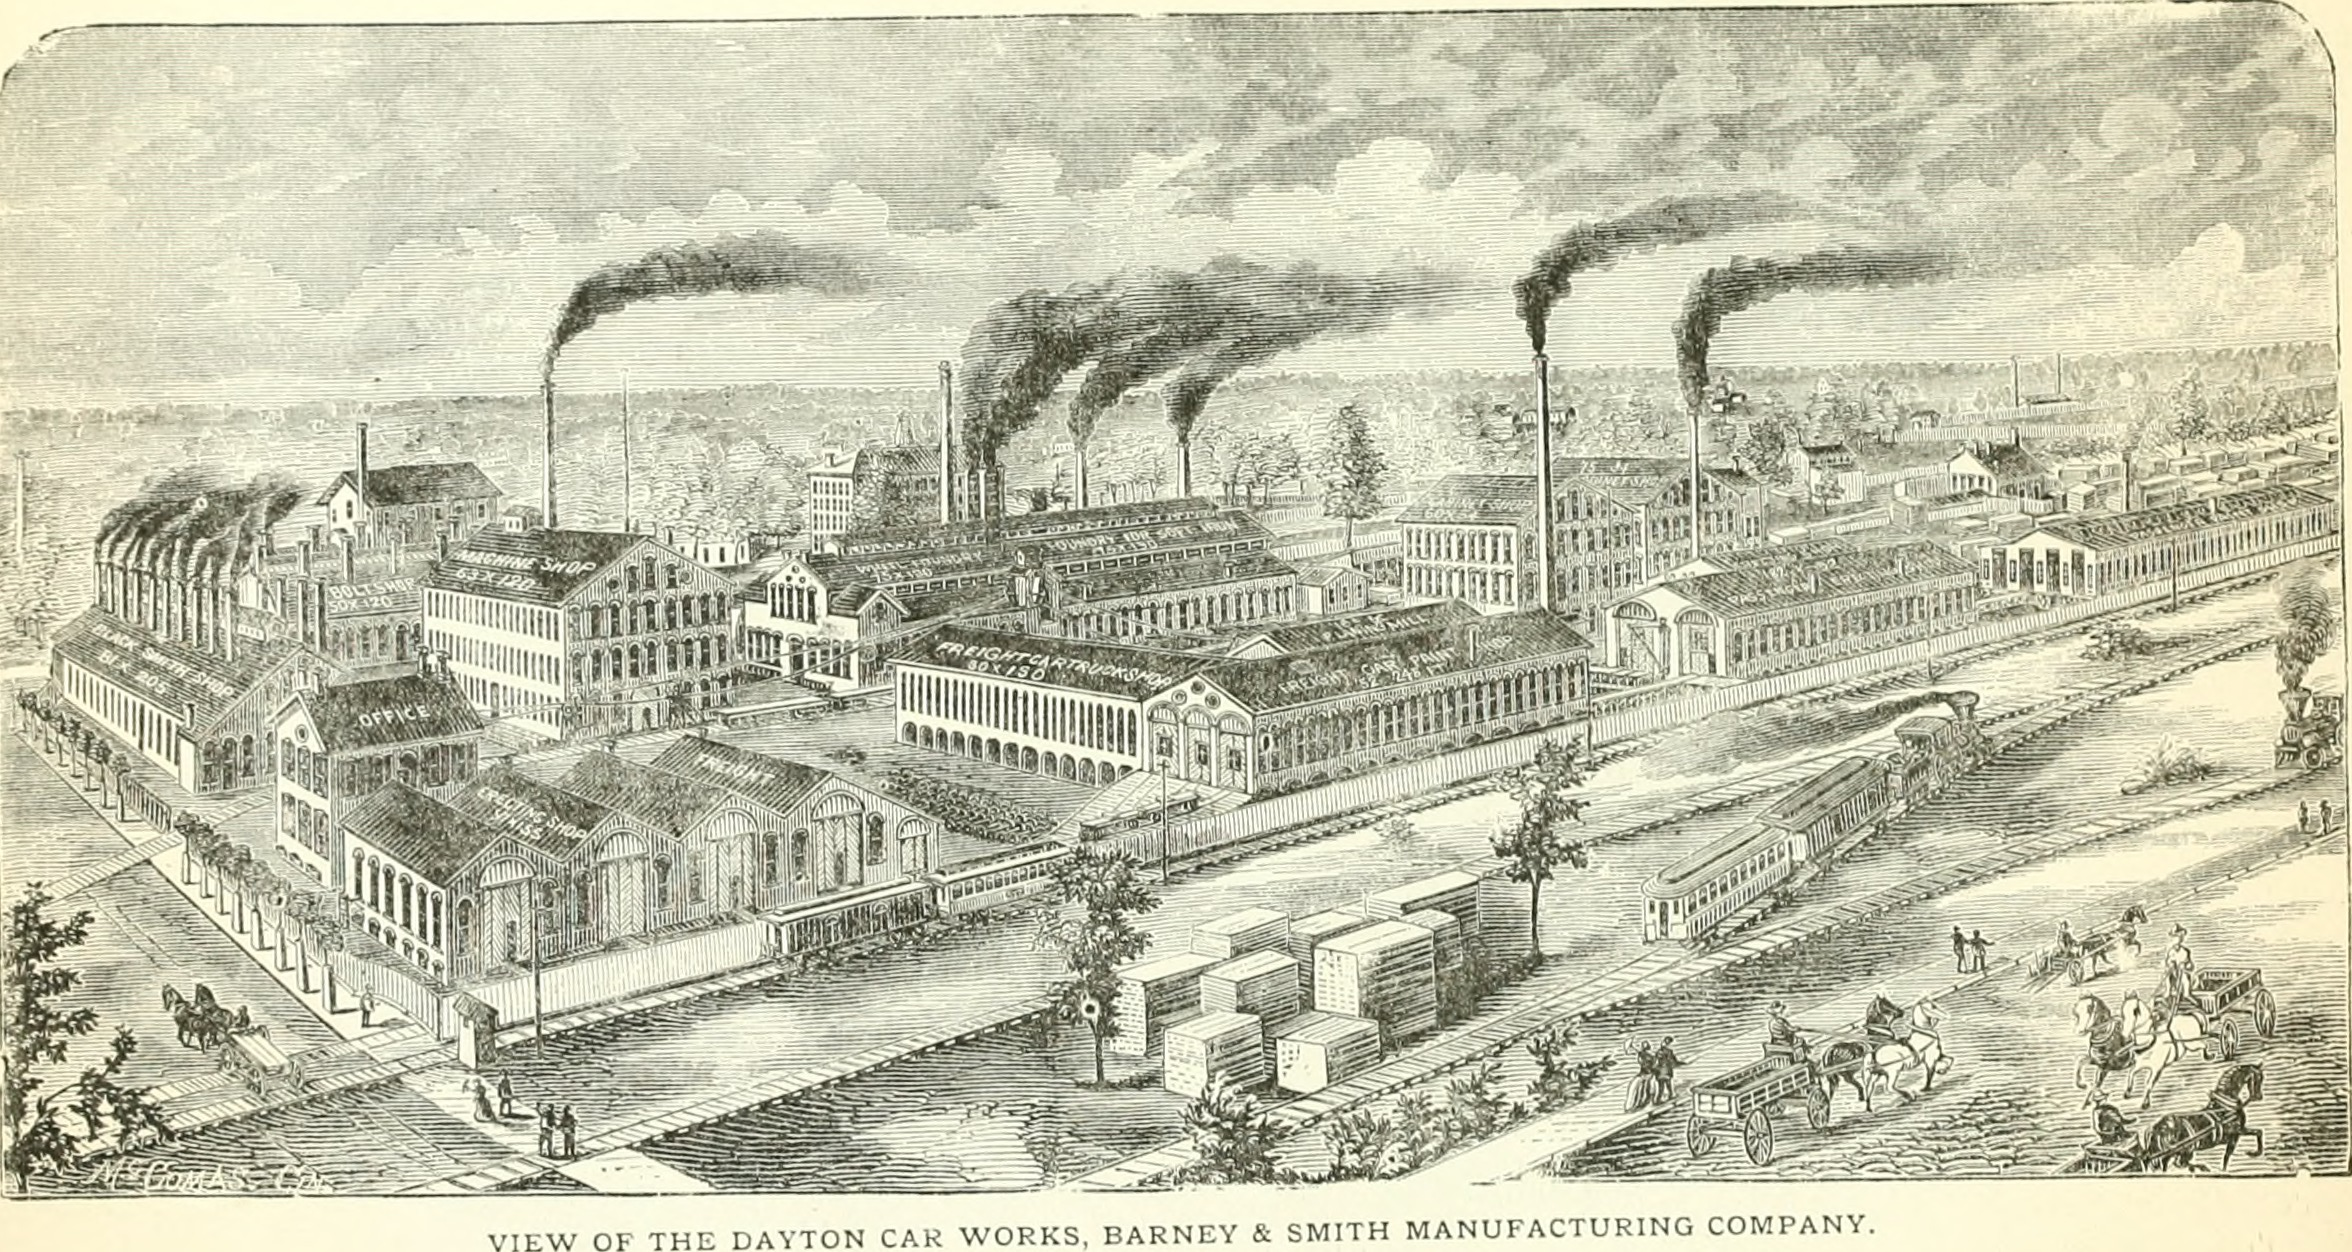 history of dayton car companies